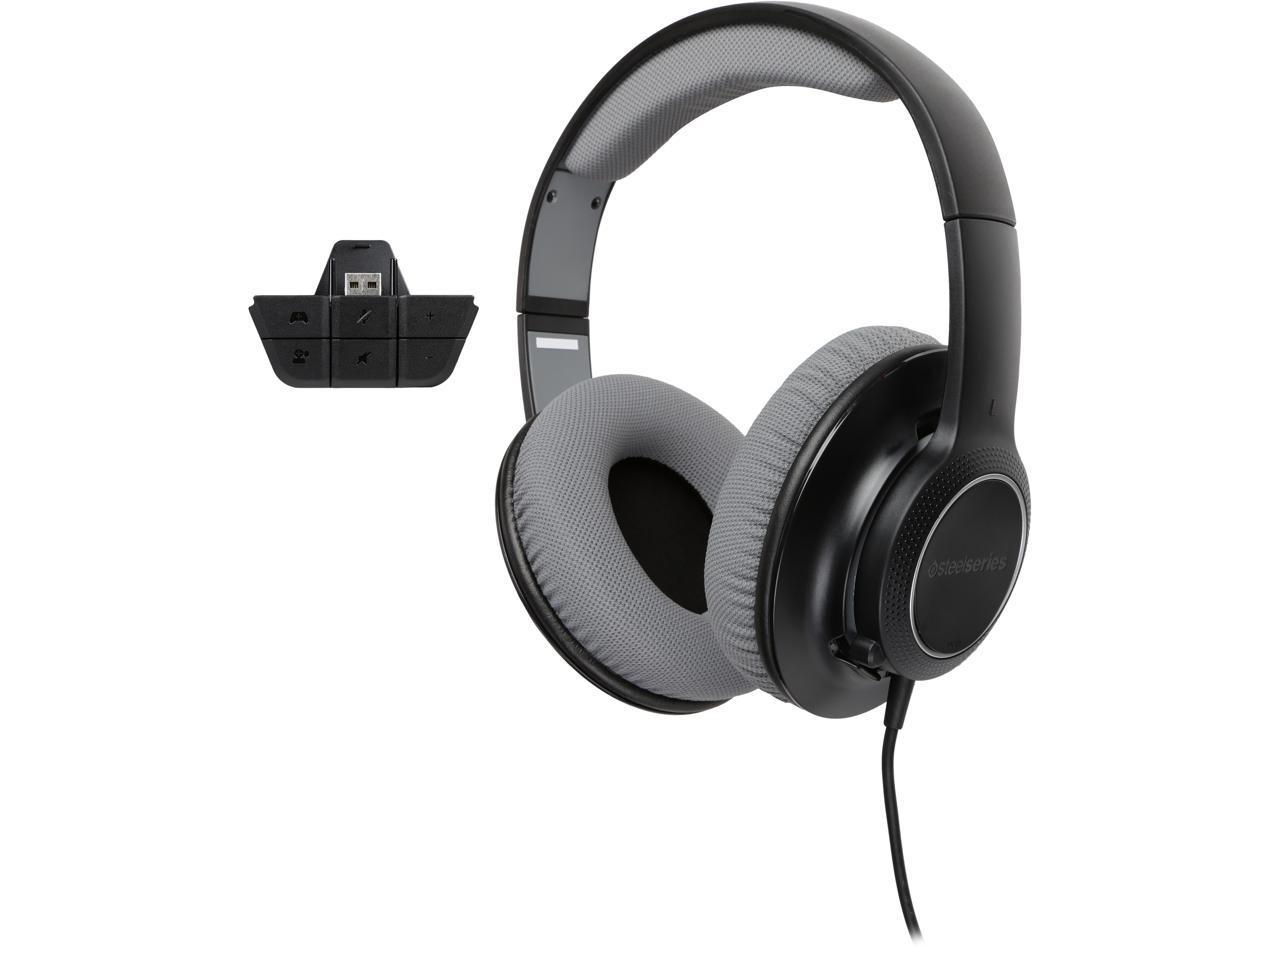 SteelSeries Siberia X100 Over-Ear 3.5mm Wired Gaming Headphones